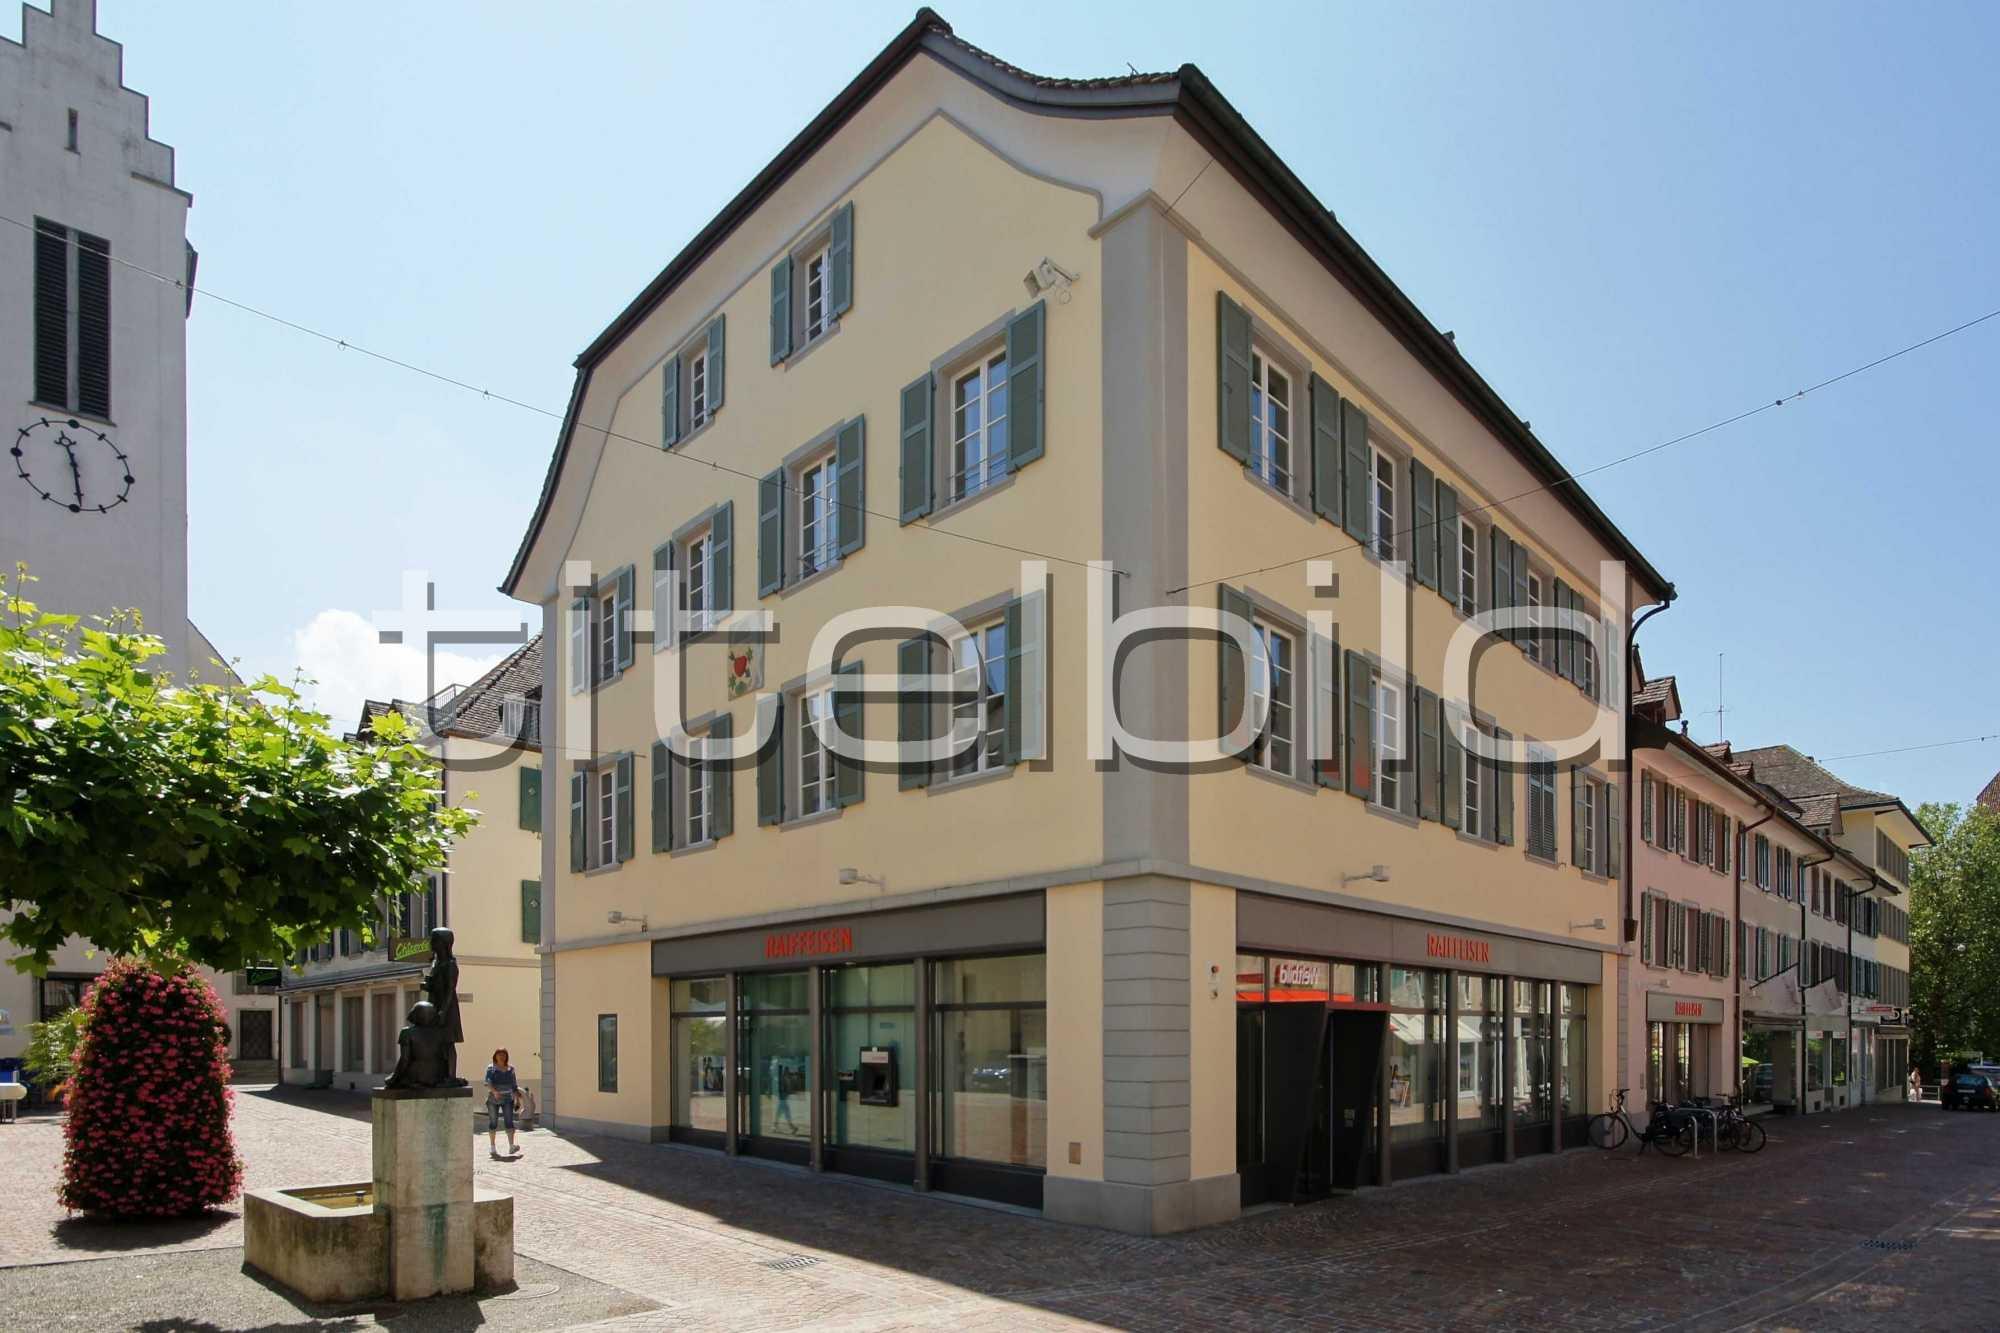 Projektbild-Nr. 0: Bankgebäude der Raiffeisenbank Frauenfeld